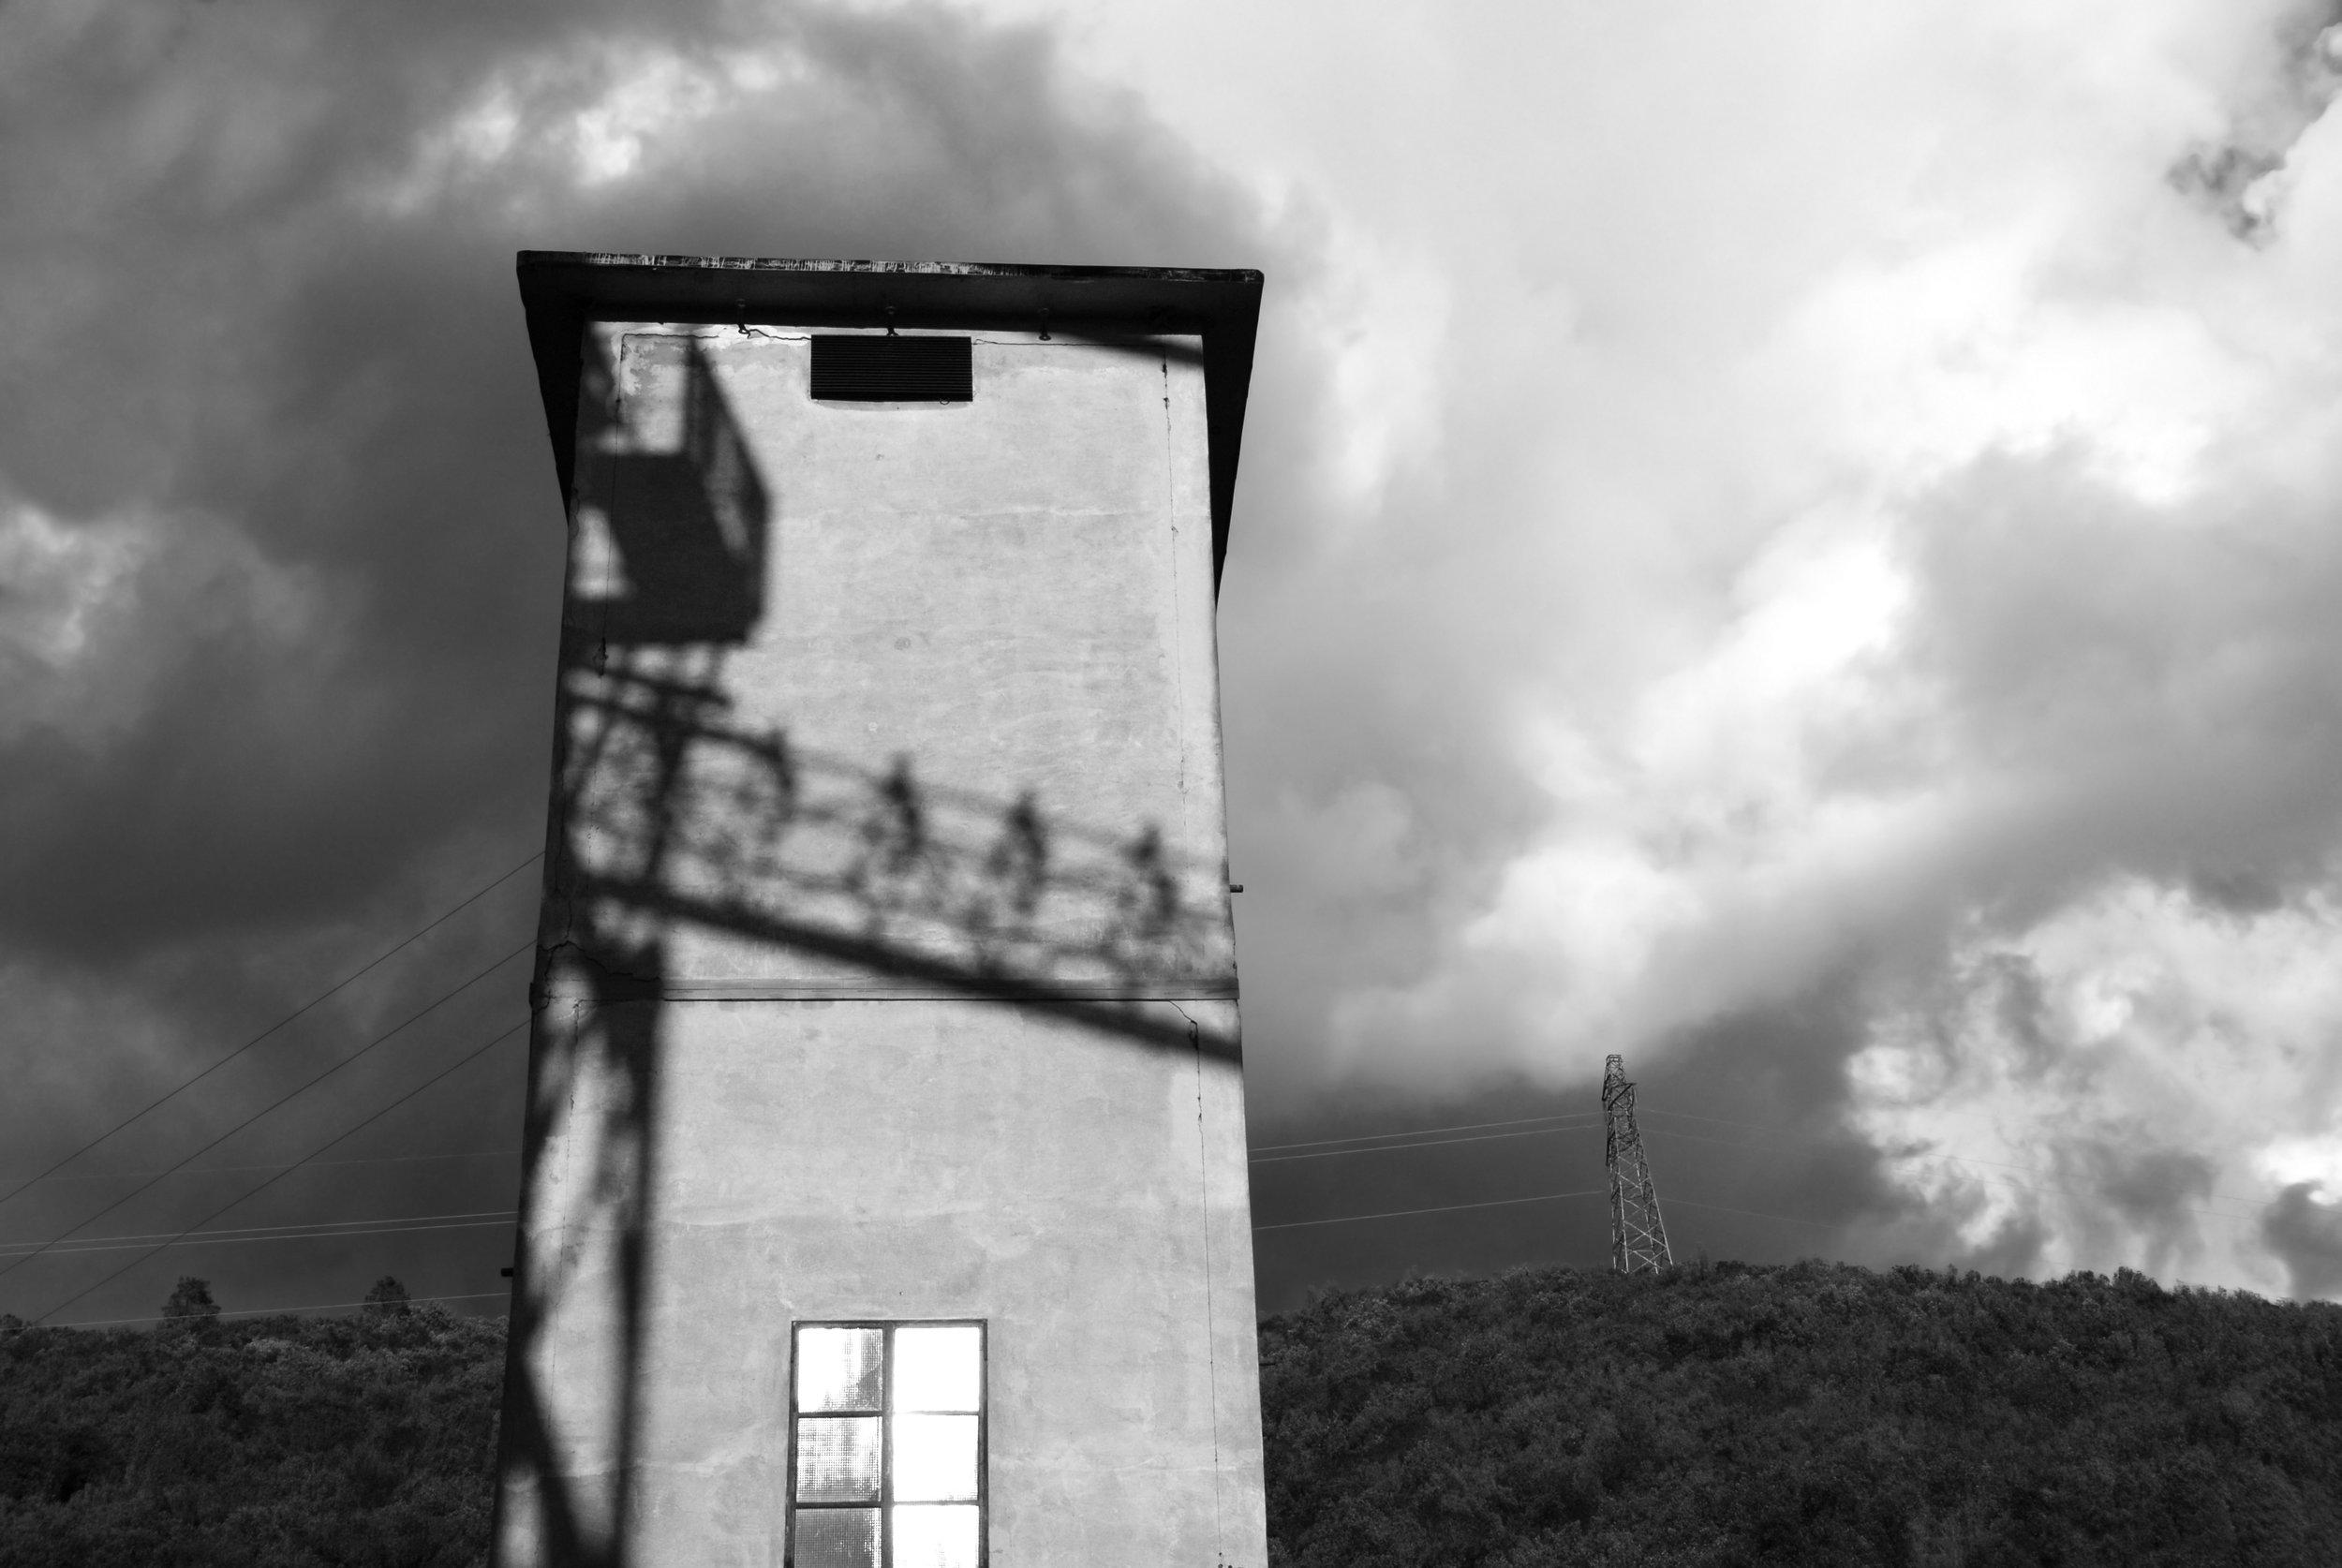 Angela Pietribiasi,  Paralleli, interferenze, sparizioni,  2012-2019, stampa fine art ai pigmenti su carta cotone, 50 x 30 cm, courtesy Angela Pietribiasi